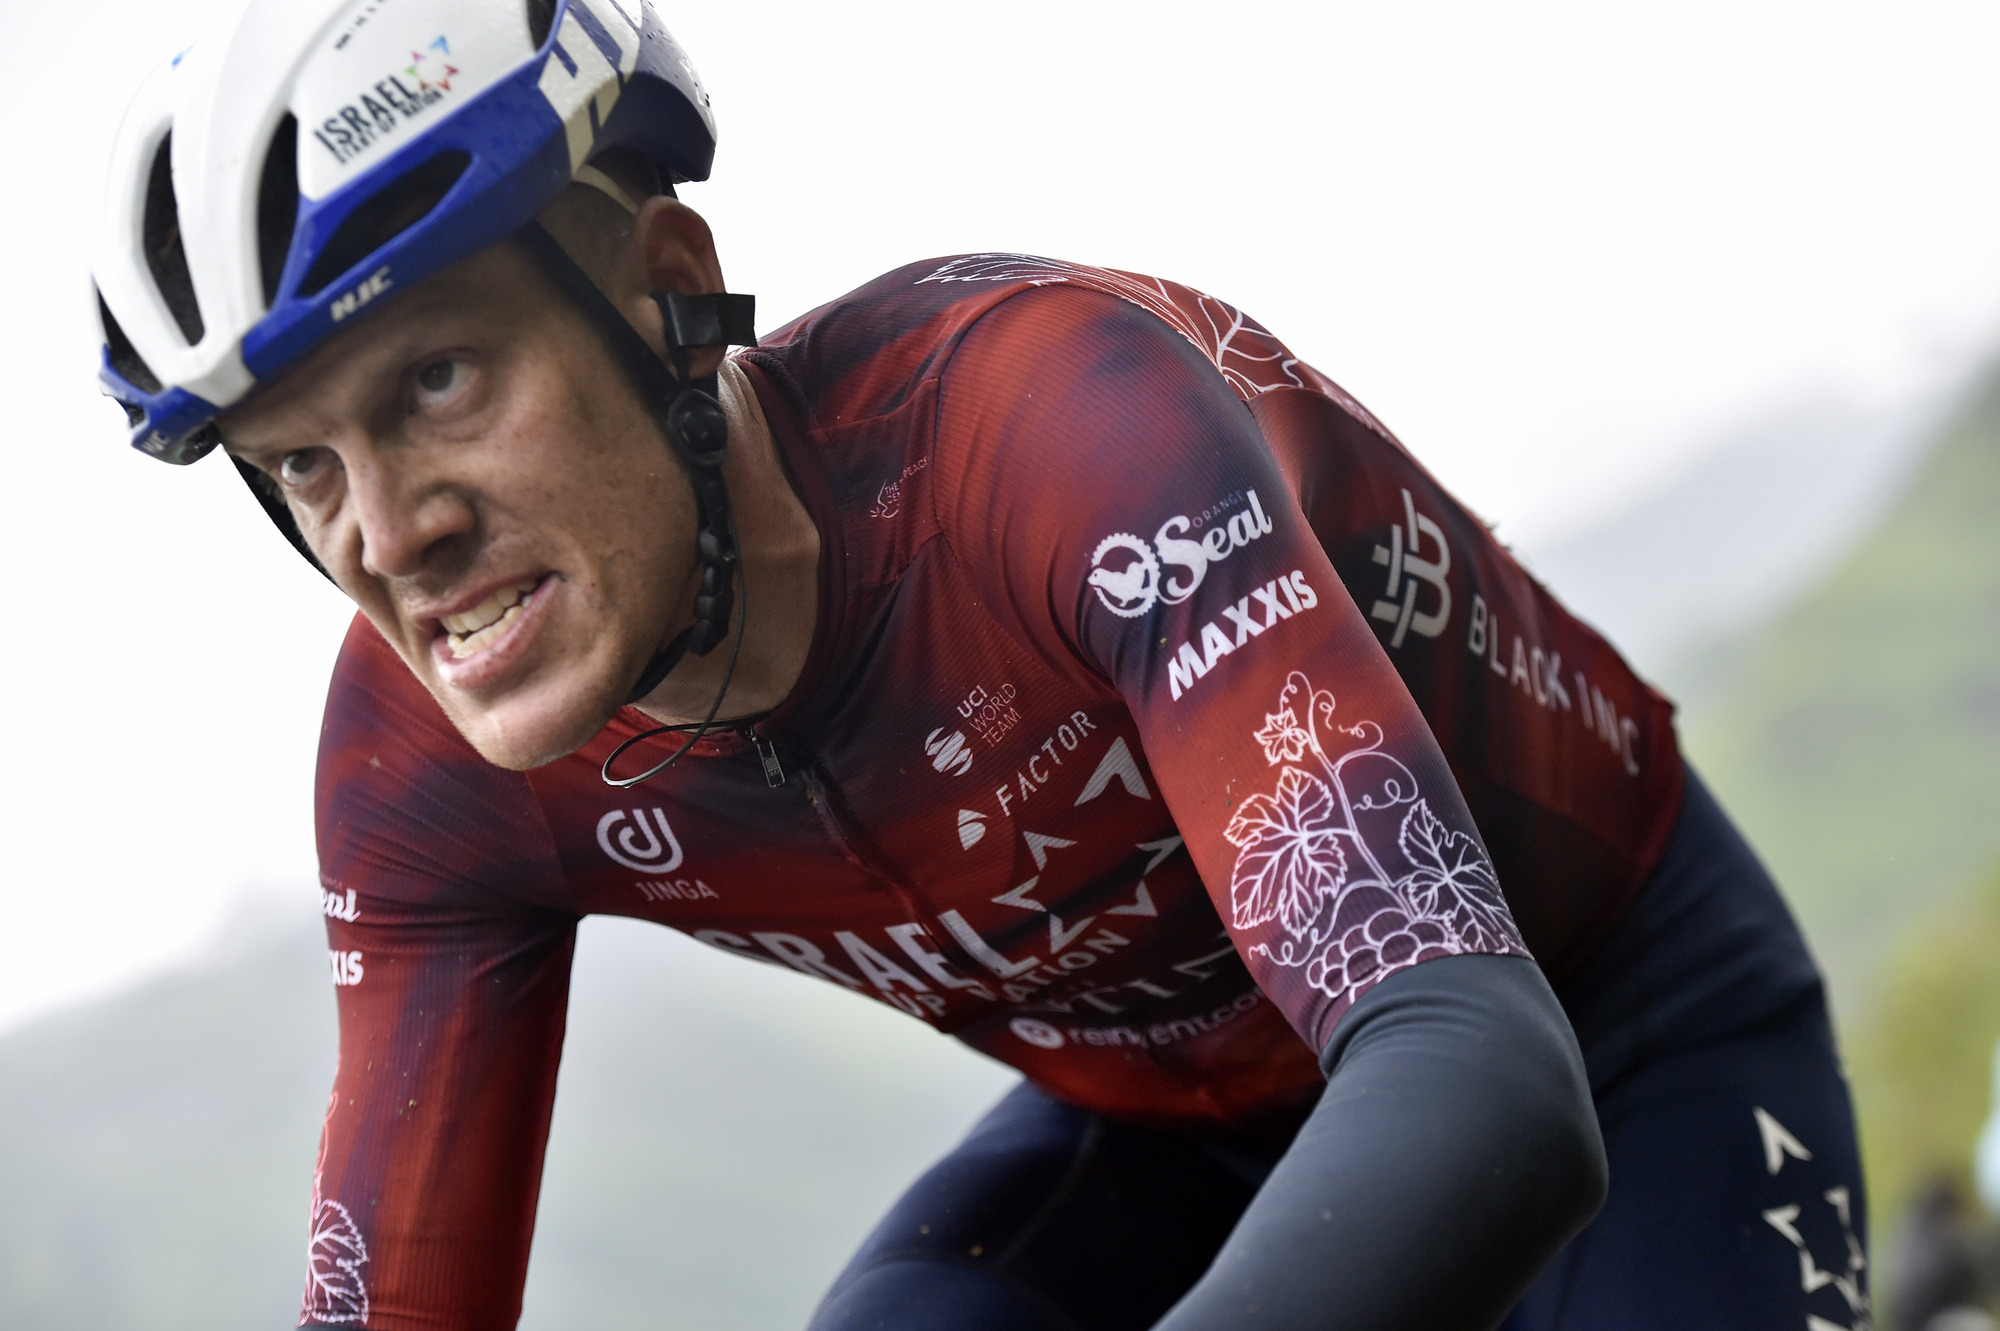 Giro d'Italia 2021 - 104th Edition - 4th stage Piacenza - Sestola 187 km - 11/05/2021 - Alessandro De Marchi (ITA - Israel Start-Up Nation) - photo Tommaso Pelagalli/BettiniPhoto©2021